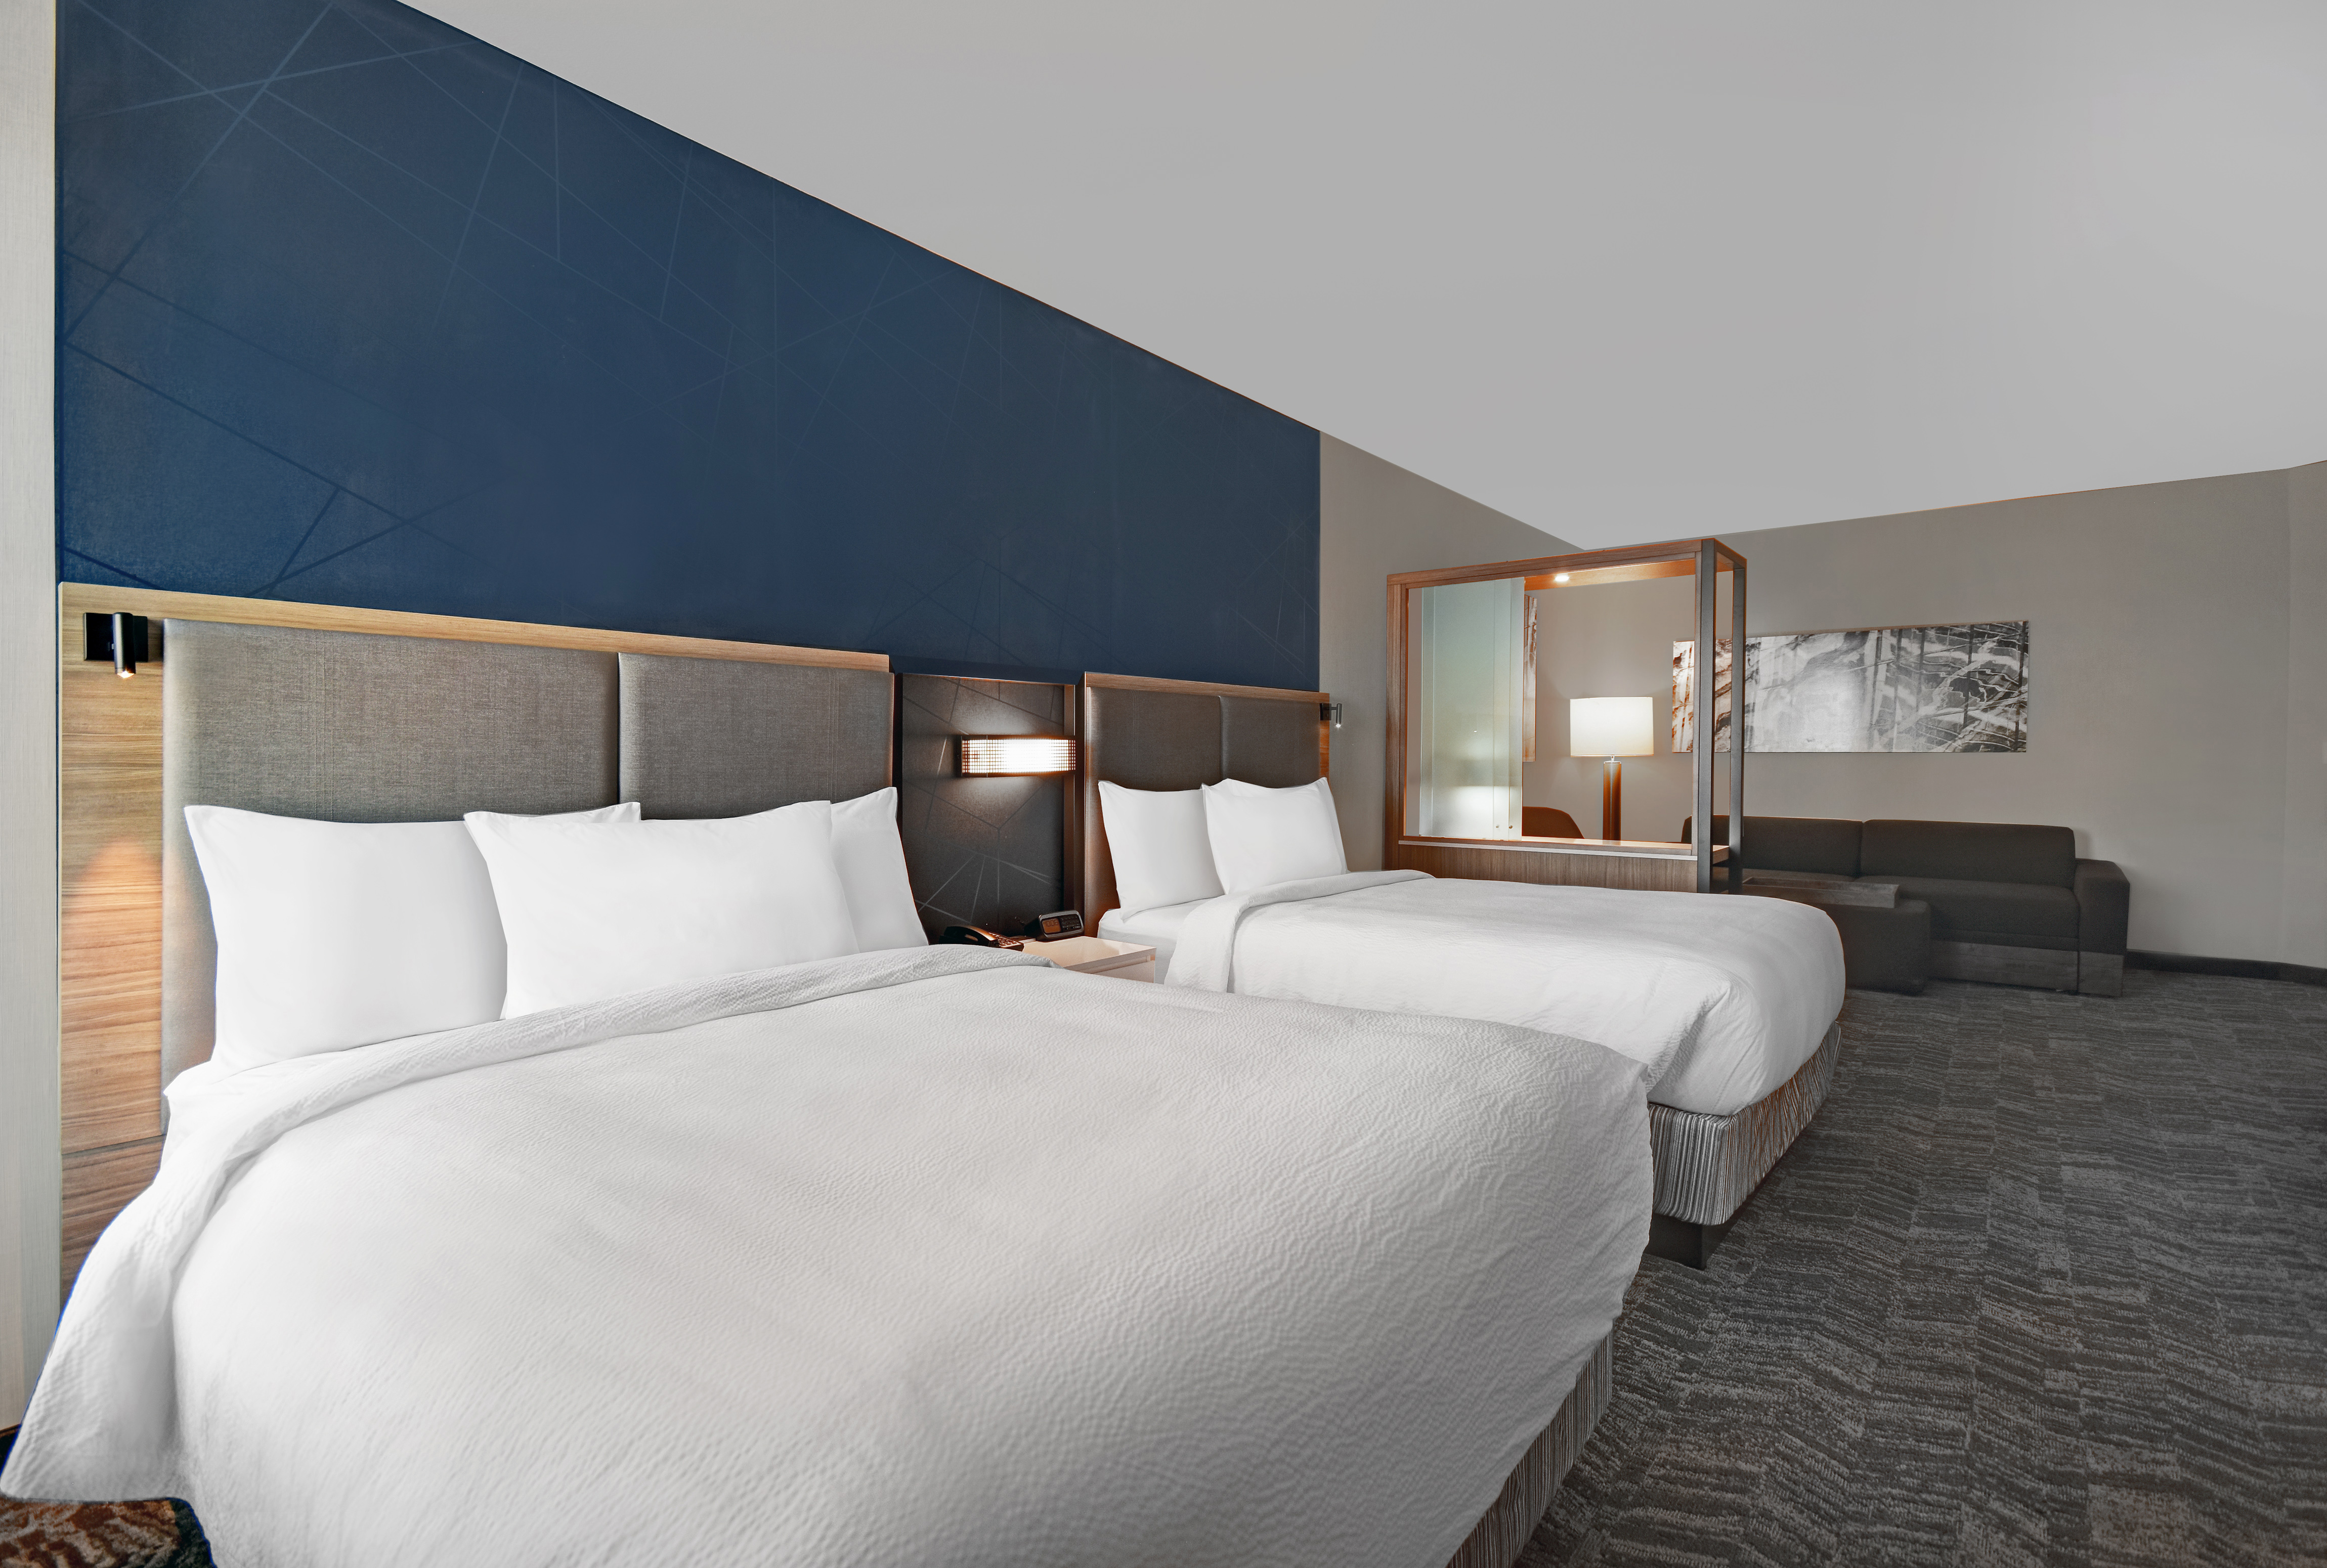 https://www.hotelsbyday.com/_data/default-hotel_image/4/24915/dsc-8368-69-70.jpg